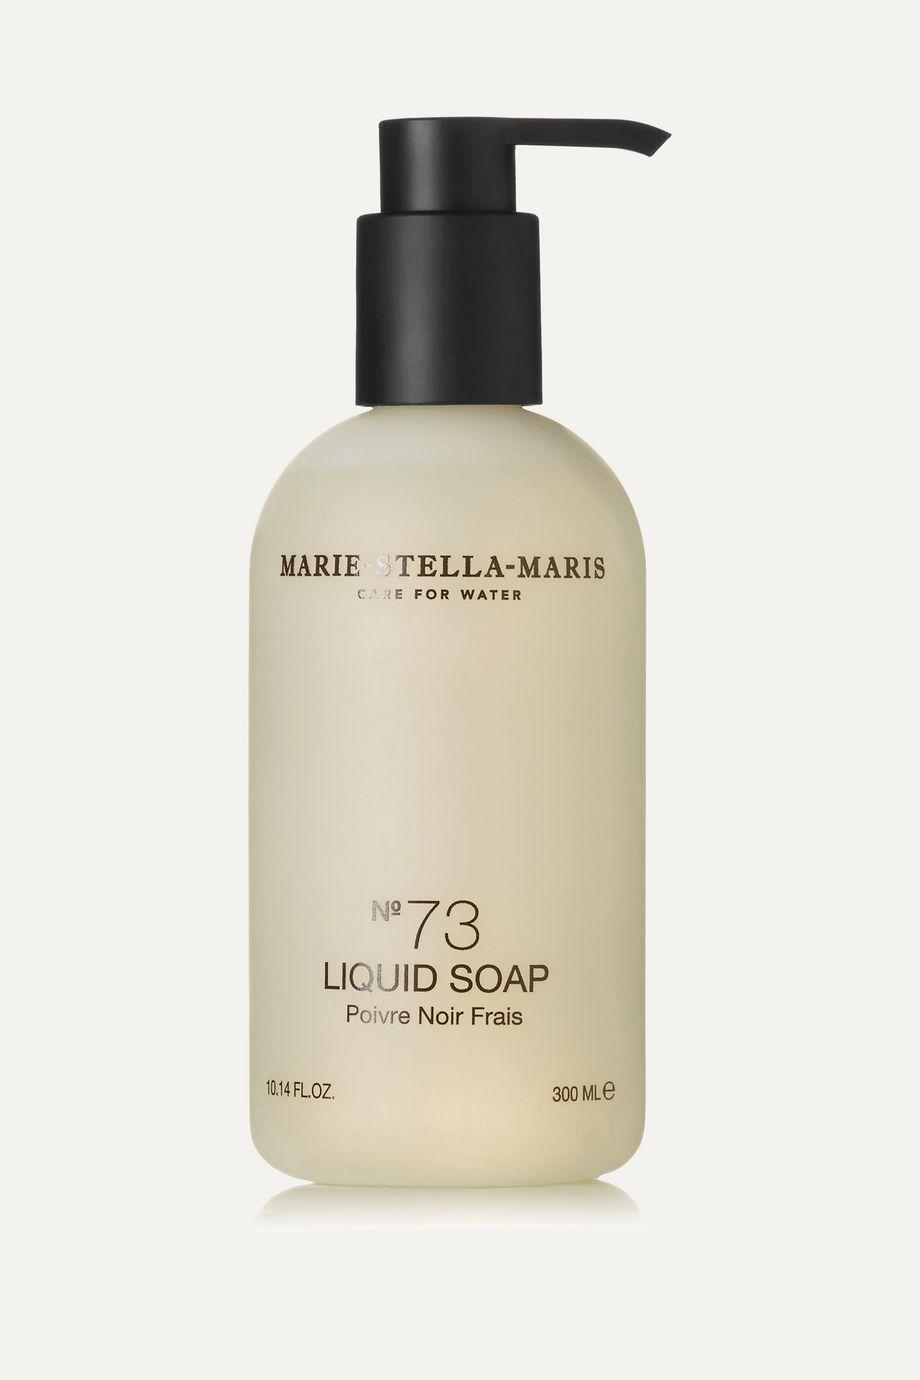 Marie-Stella-Maris Hand & Body Wash Poivre Noir Frais, 300ml